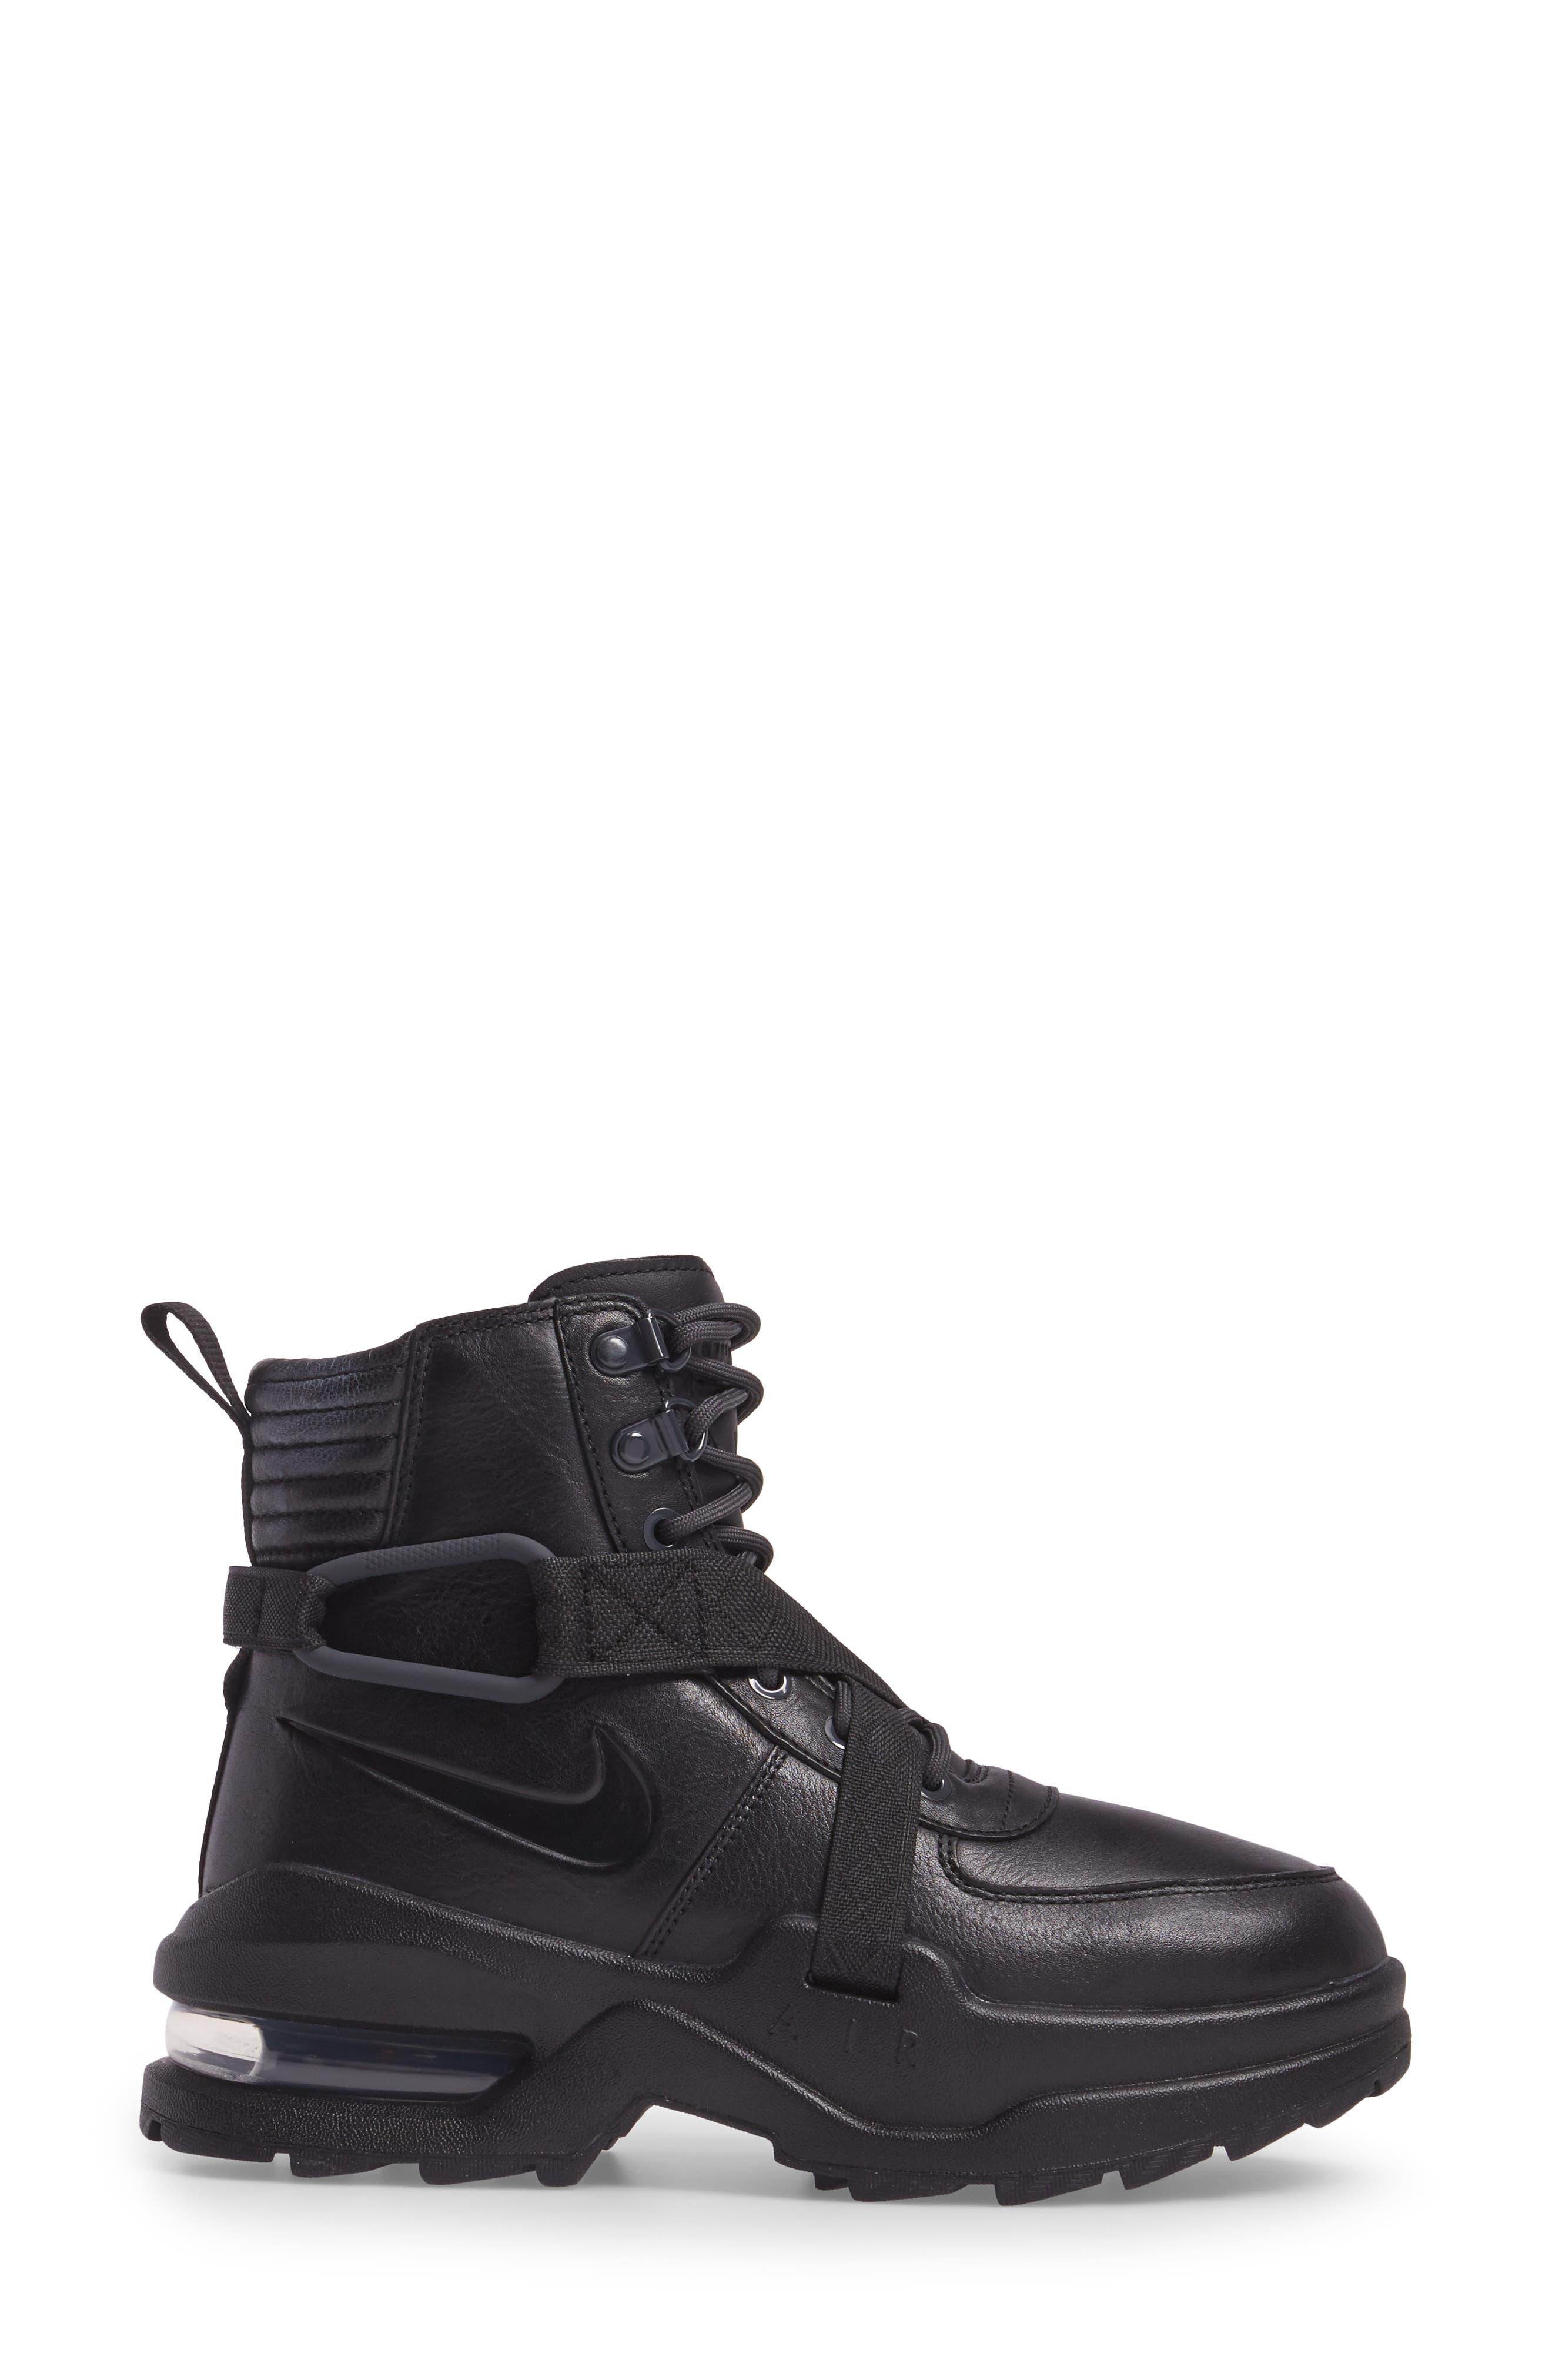 Air Max Goadome Sneaker Boot,                             Alternate thumbnail 3, color,                             BLACK/ ANTHRACITE/ BLACK